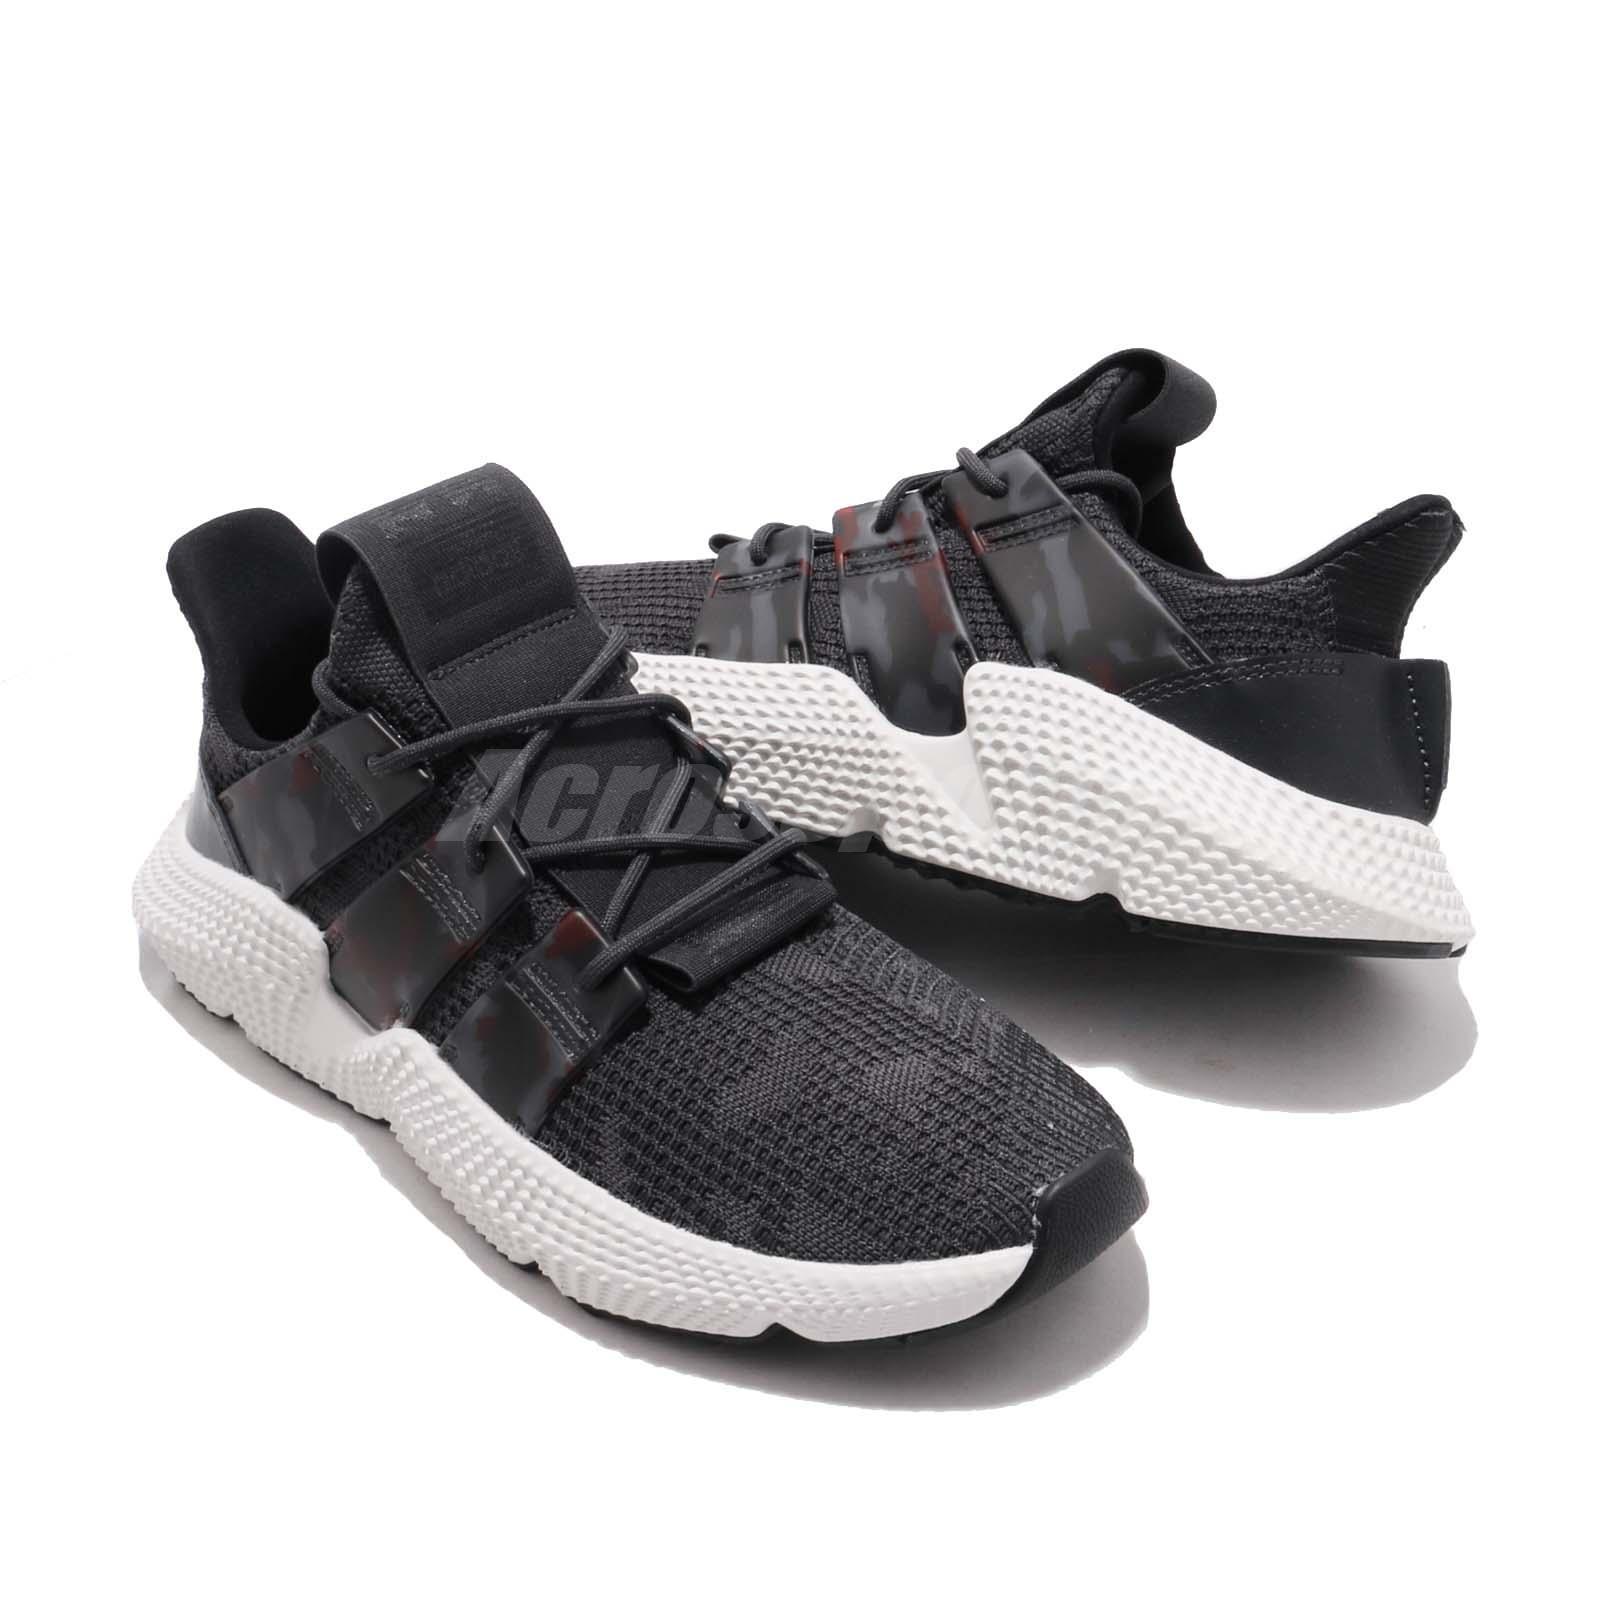 Buy Adidas Originals White Prophere Running Trainers for Men